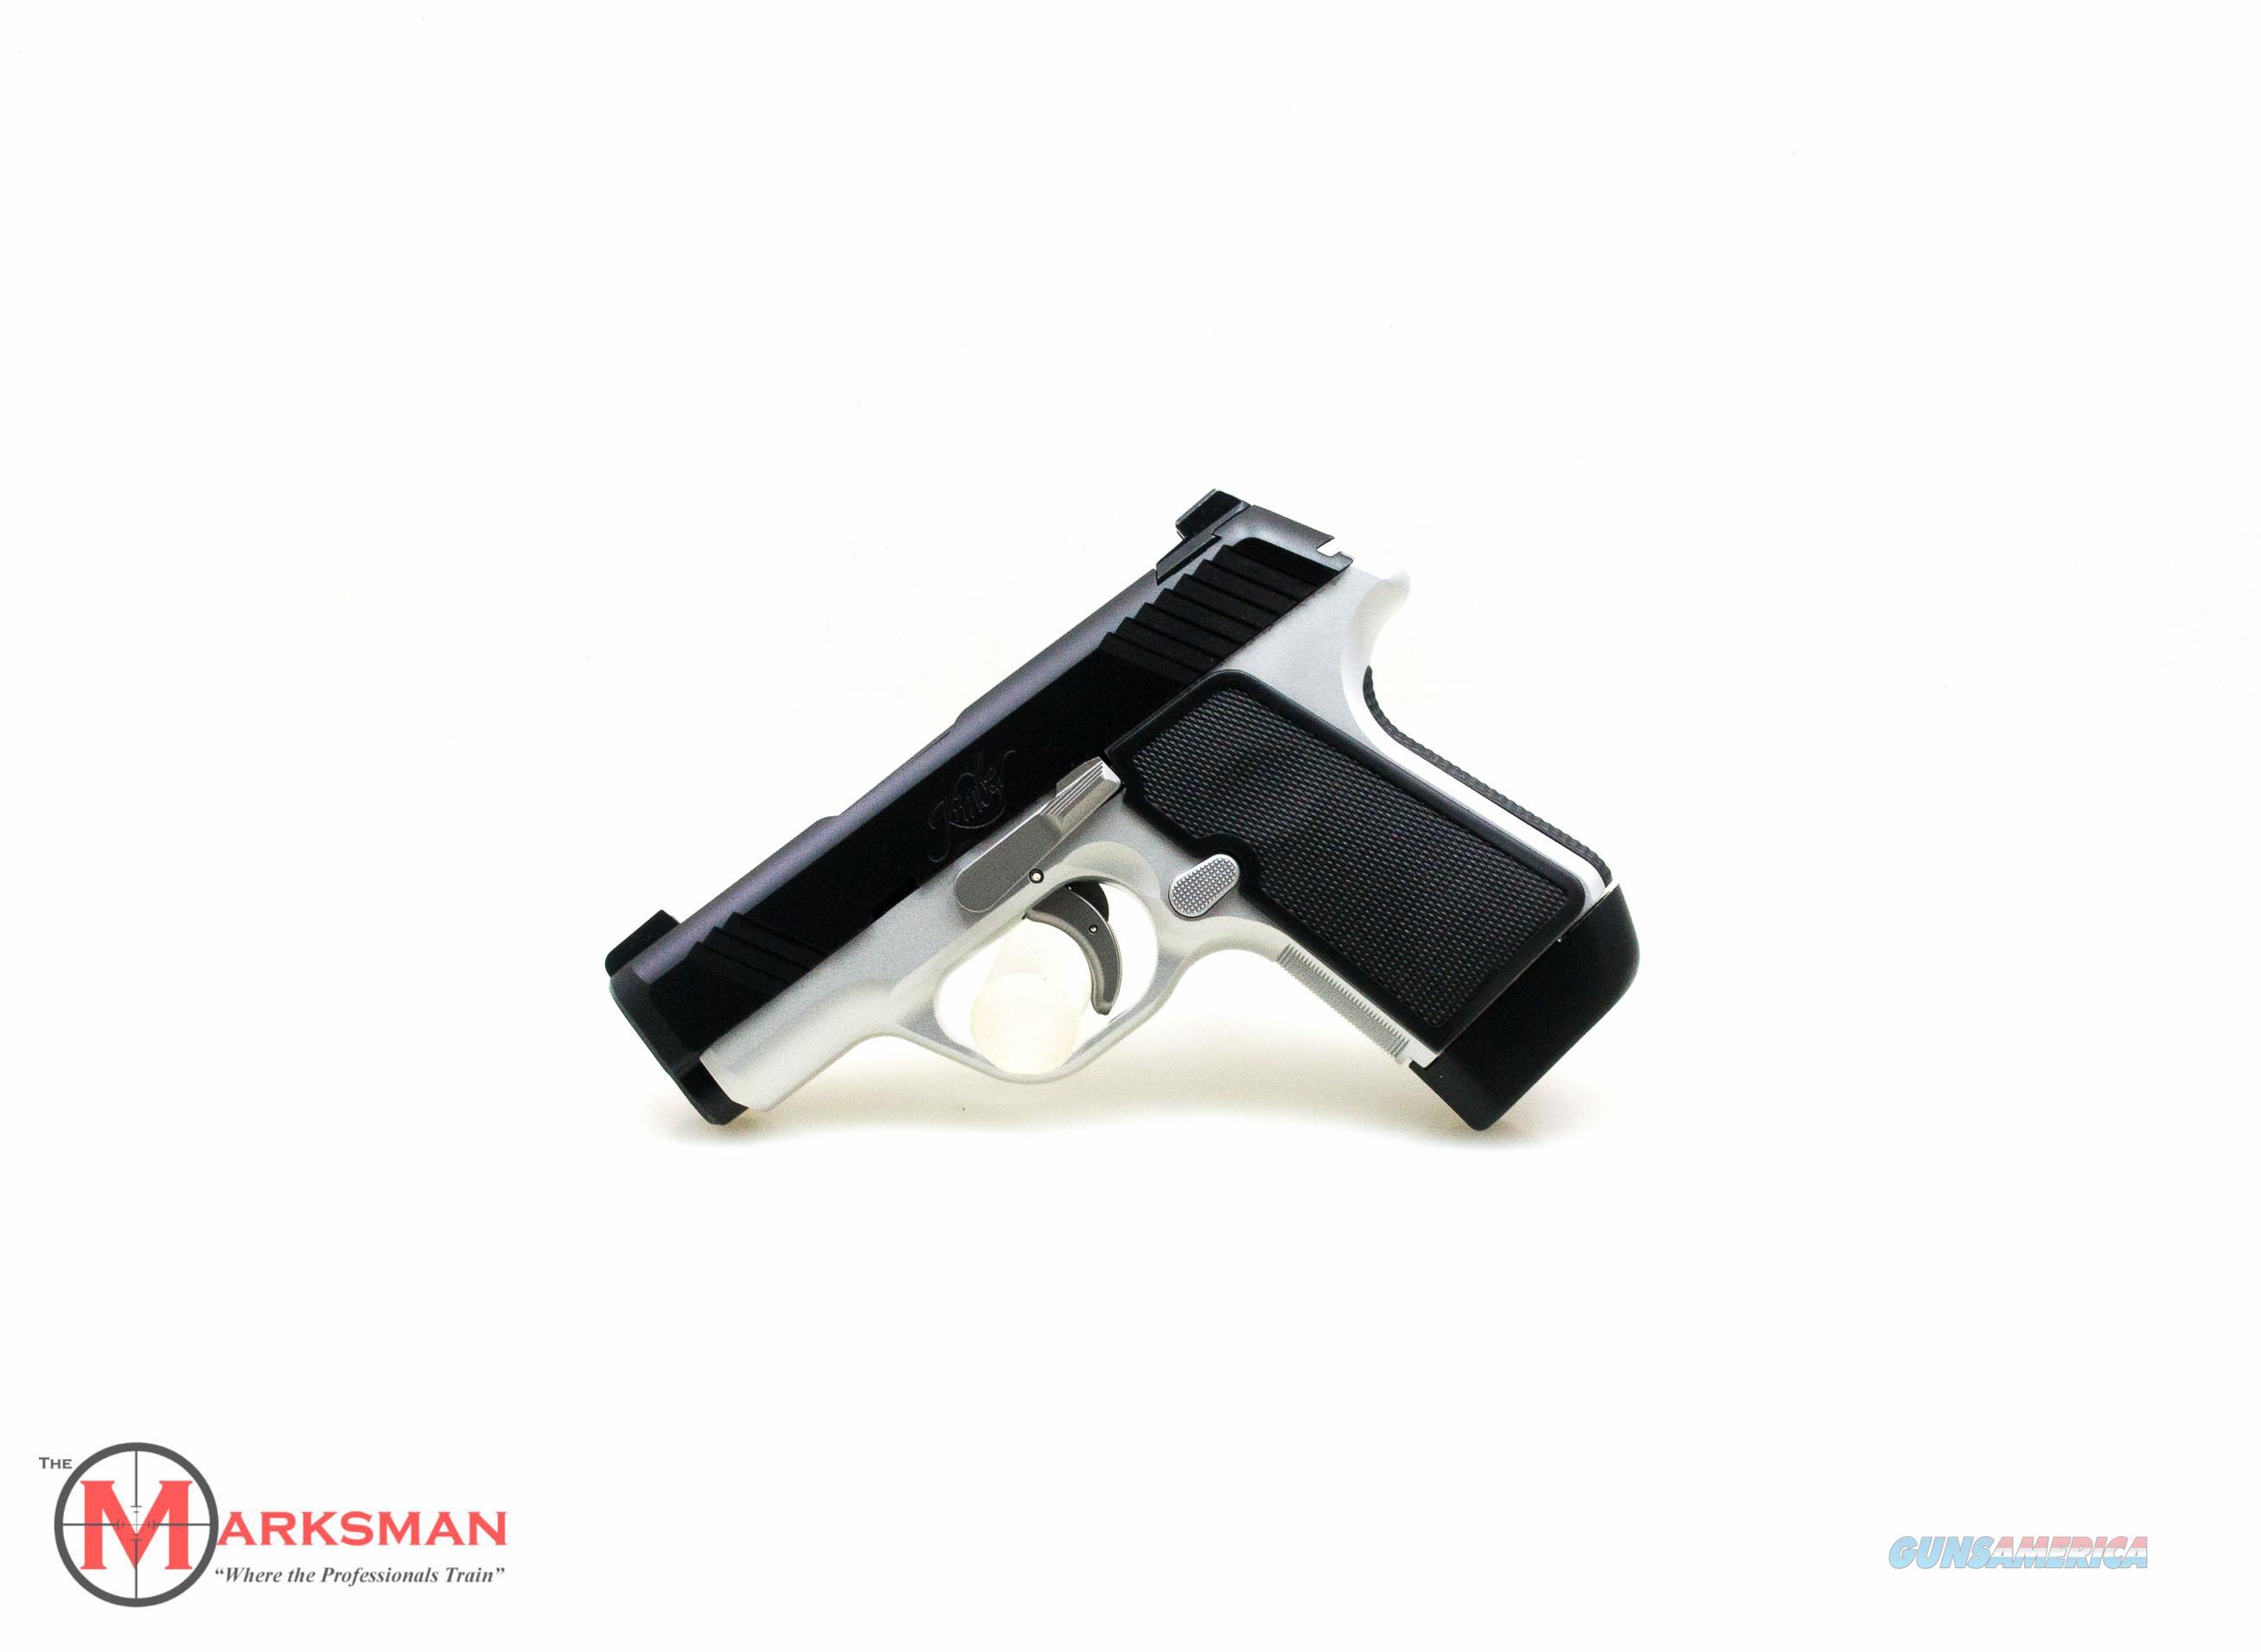 Kimber Evo SP Two Tone, 9mm, Night Sights Free Shipping  Guns > Pistols > Kimber of America Pistols > Micro 9